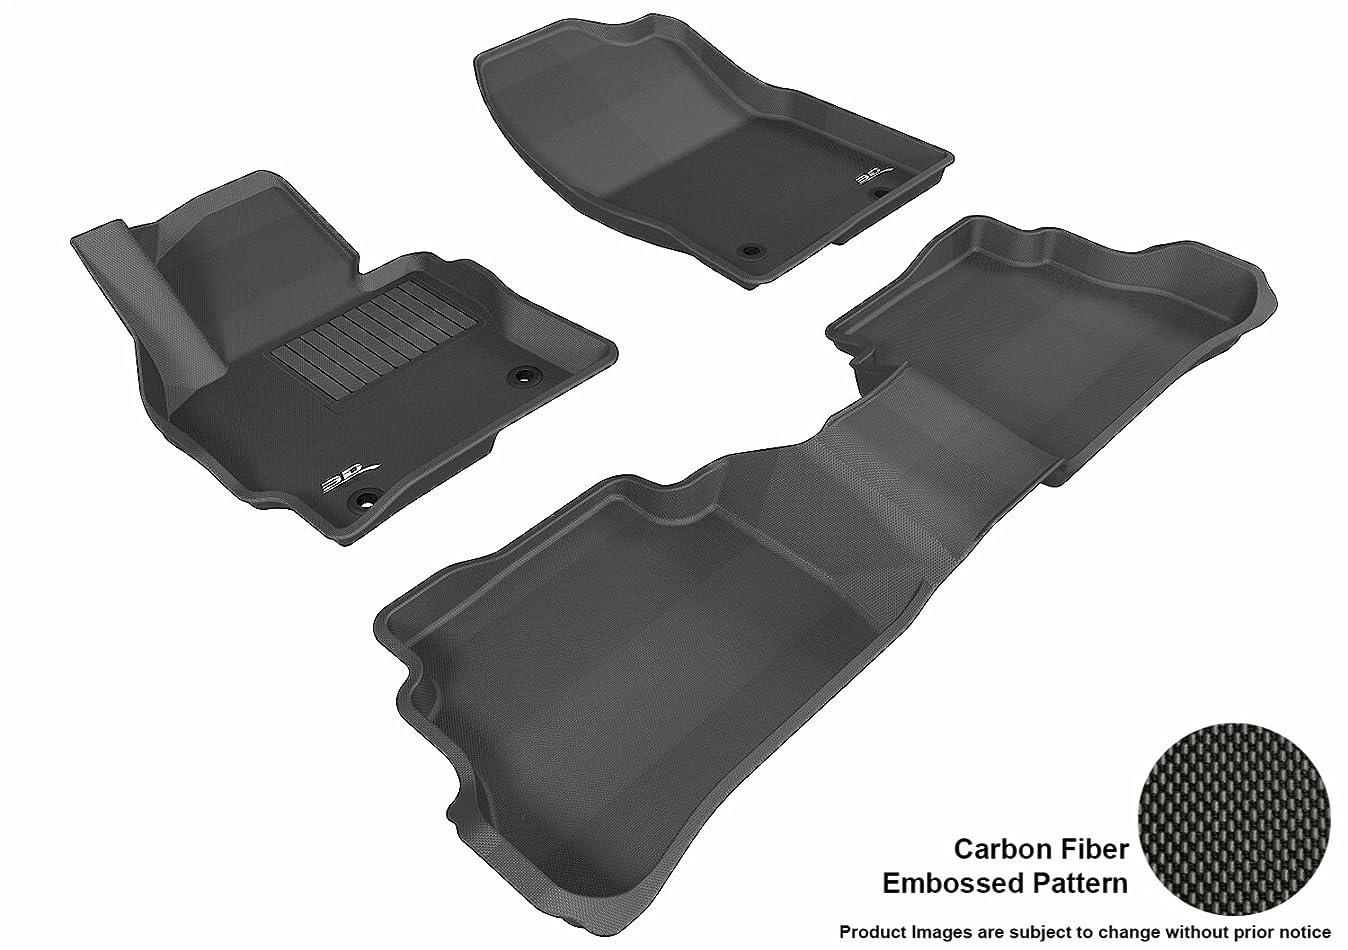 3D MAXpider Complete Set Custom Fit All-Weather Floor Mat for Select Mazda CX-5 Models - Kagu Rubber (Black) i9853791517